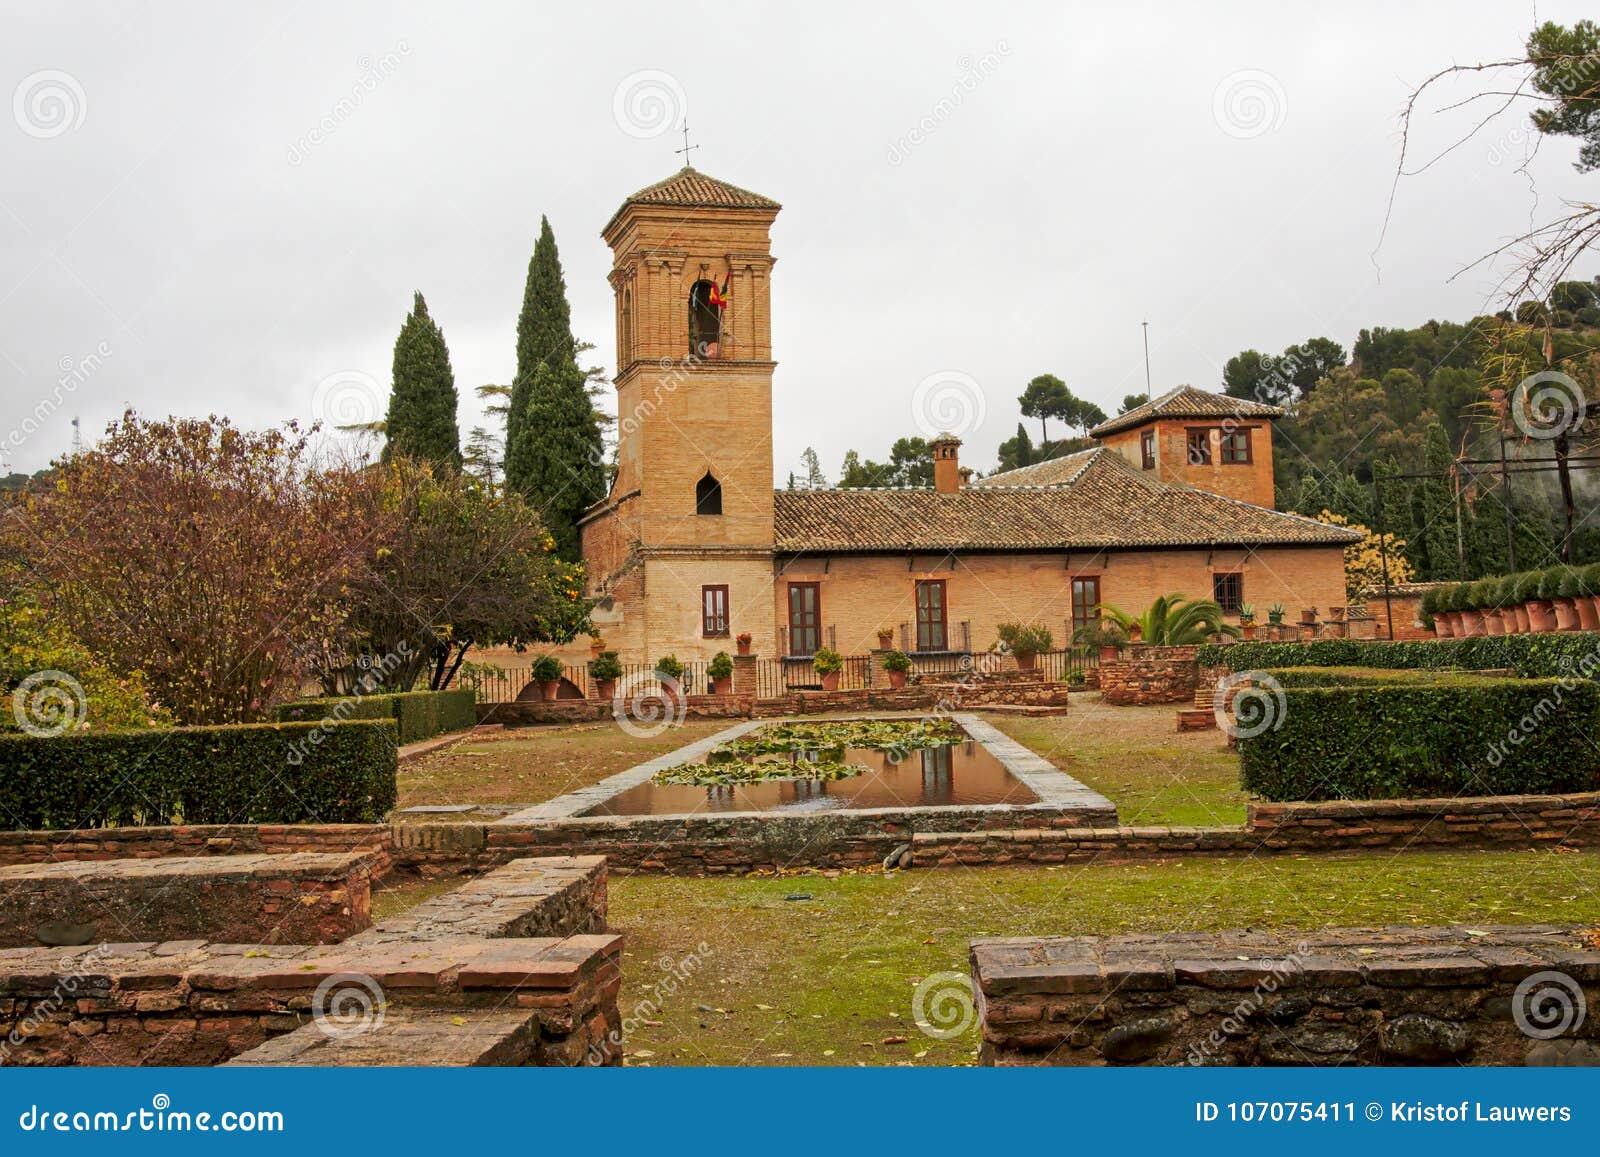 church of santa maria de alhambra granada spain on a cloudy day - Jardin De L Alhambra